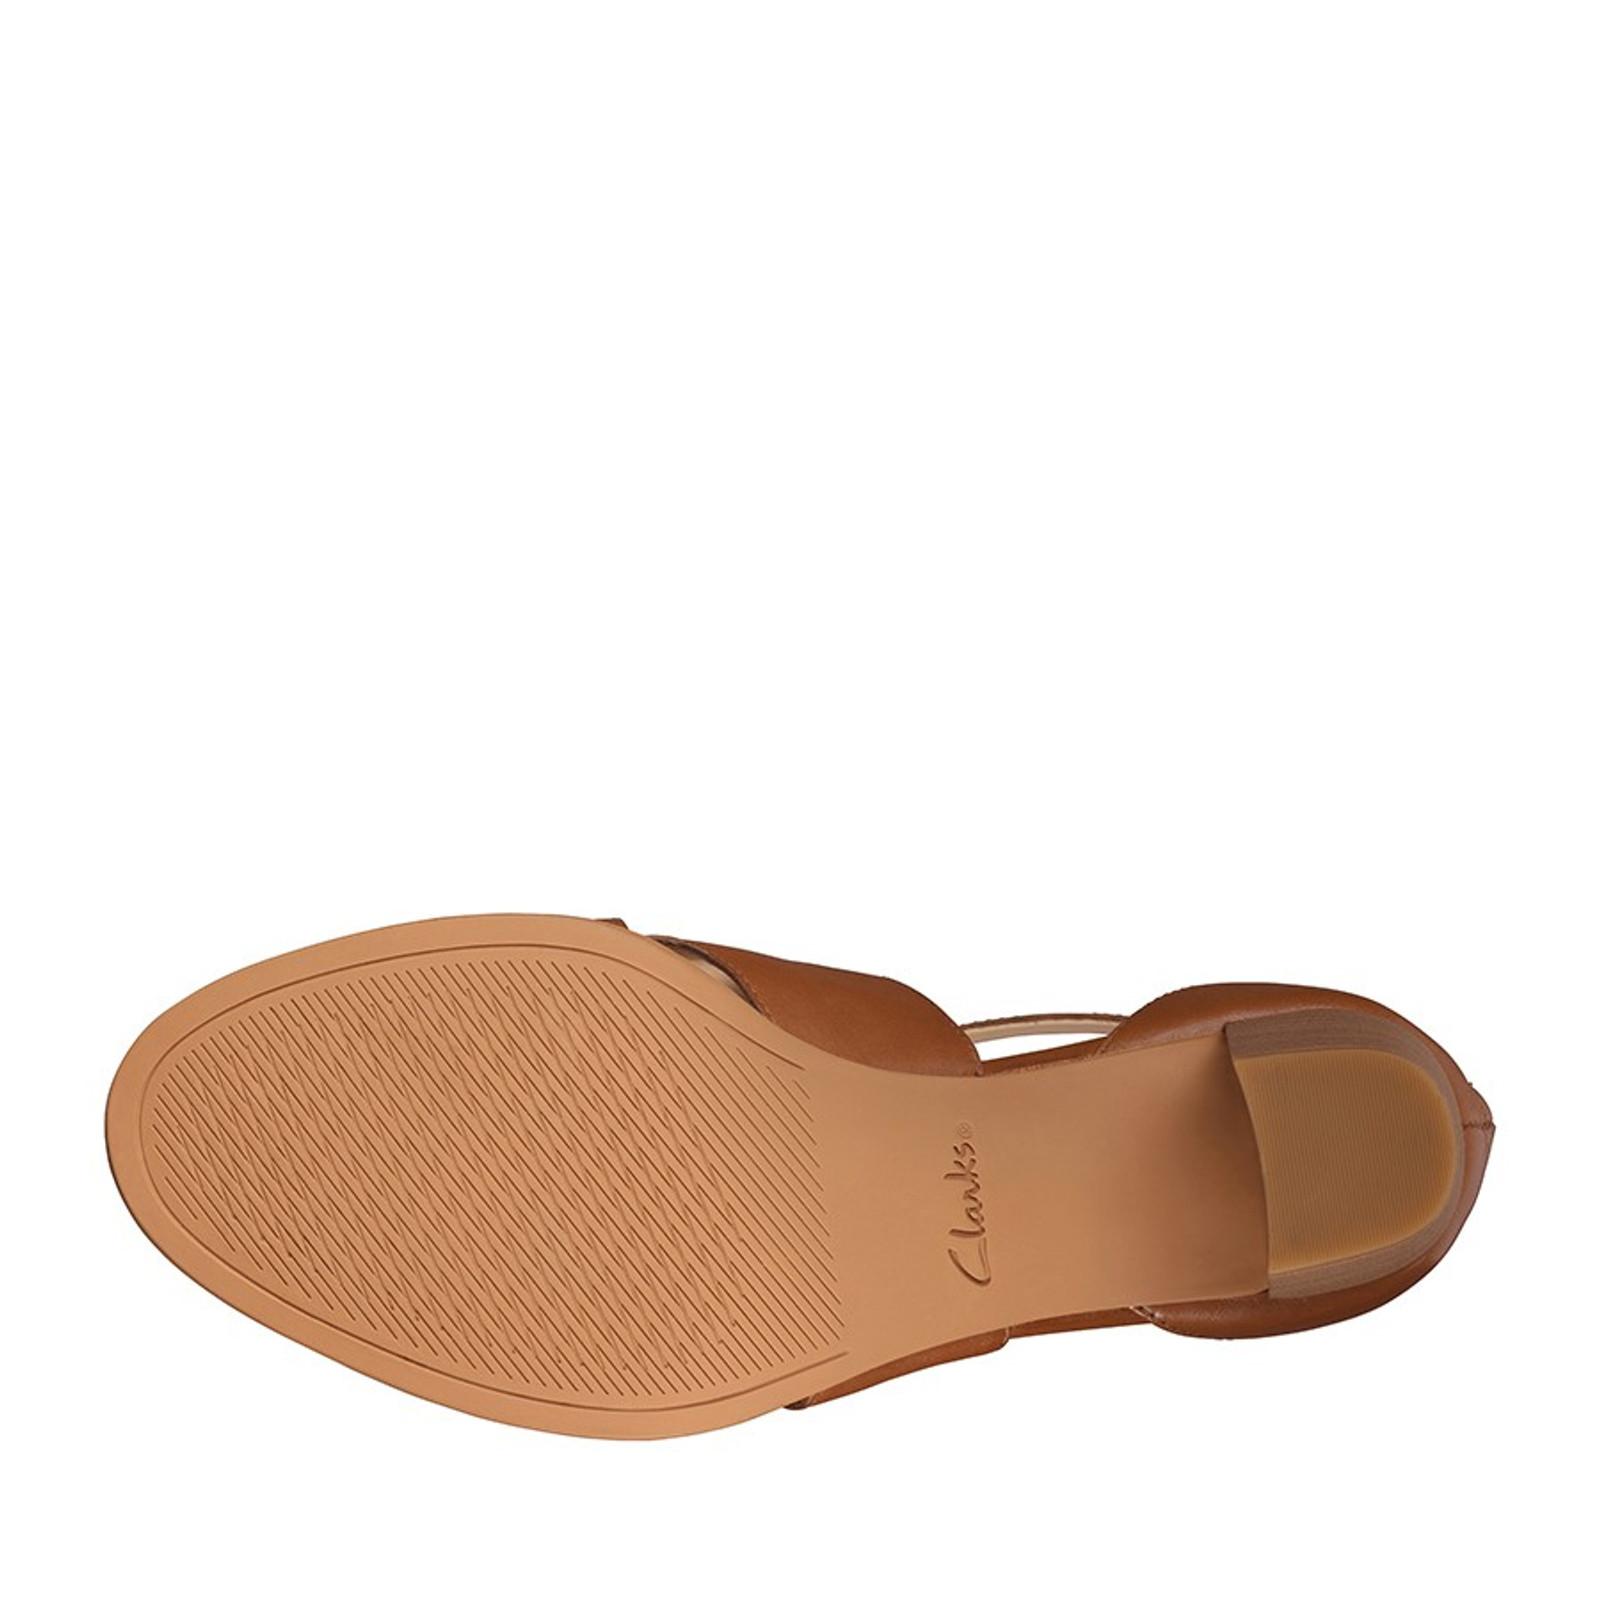 Clarks Womens KAYLIN60 GLAD Tan Leather